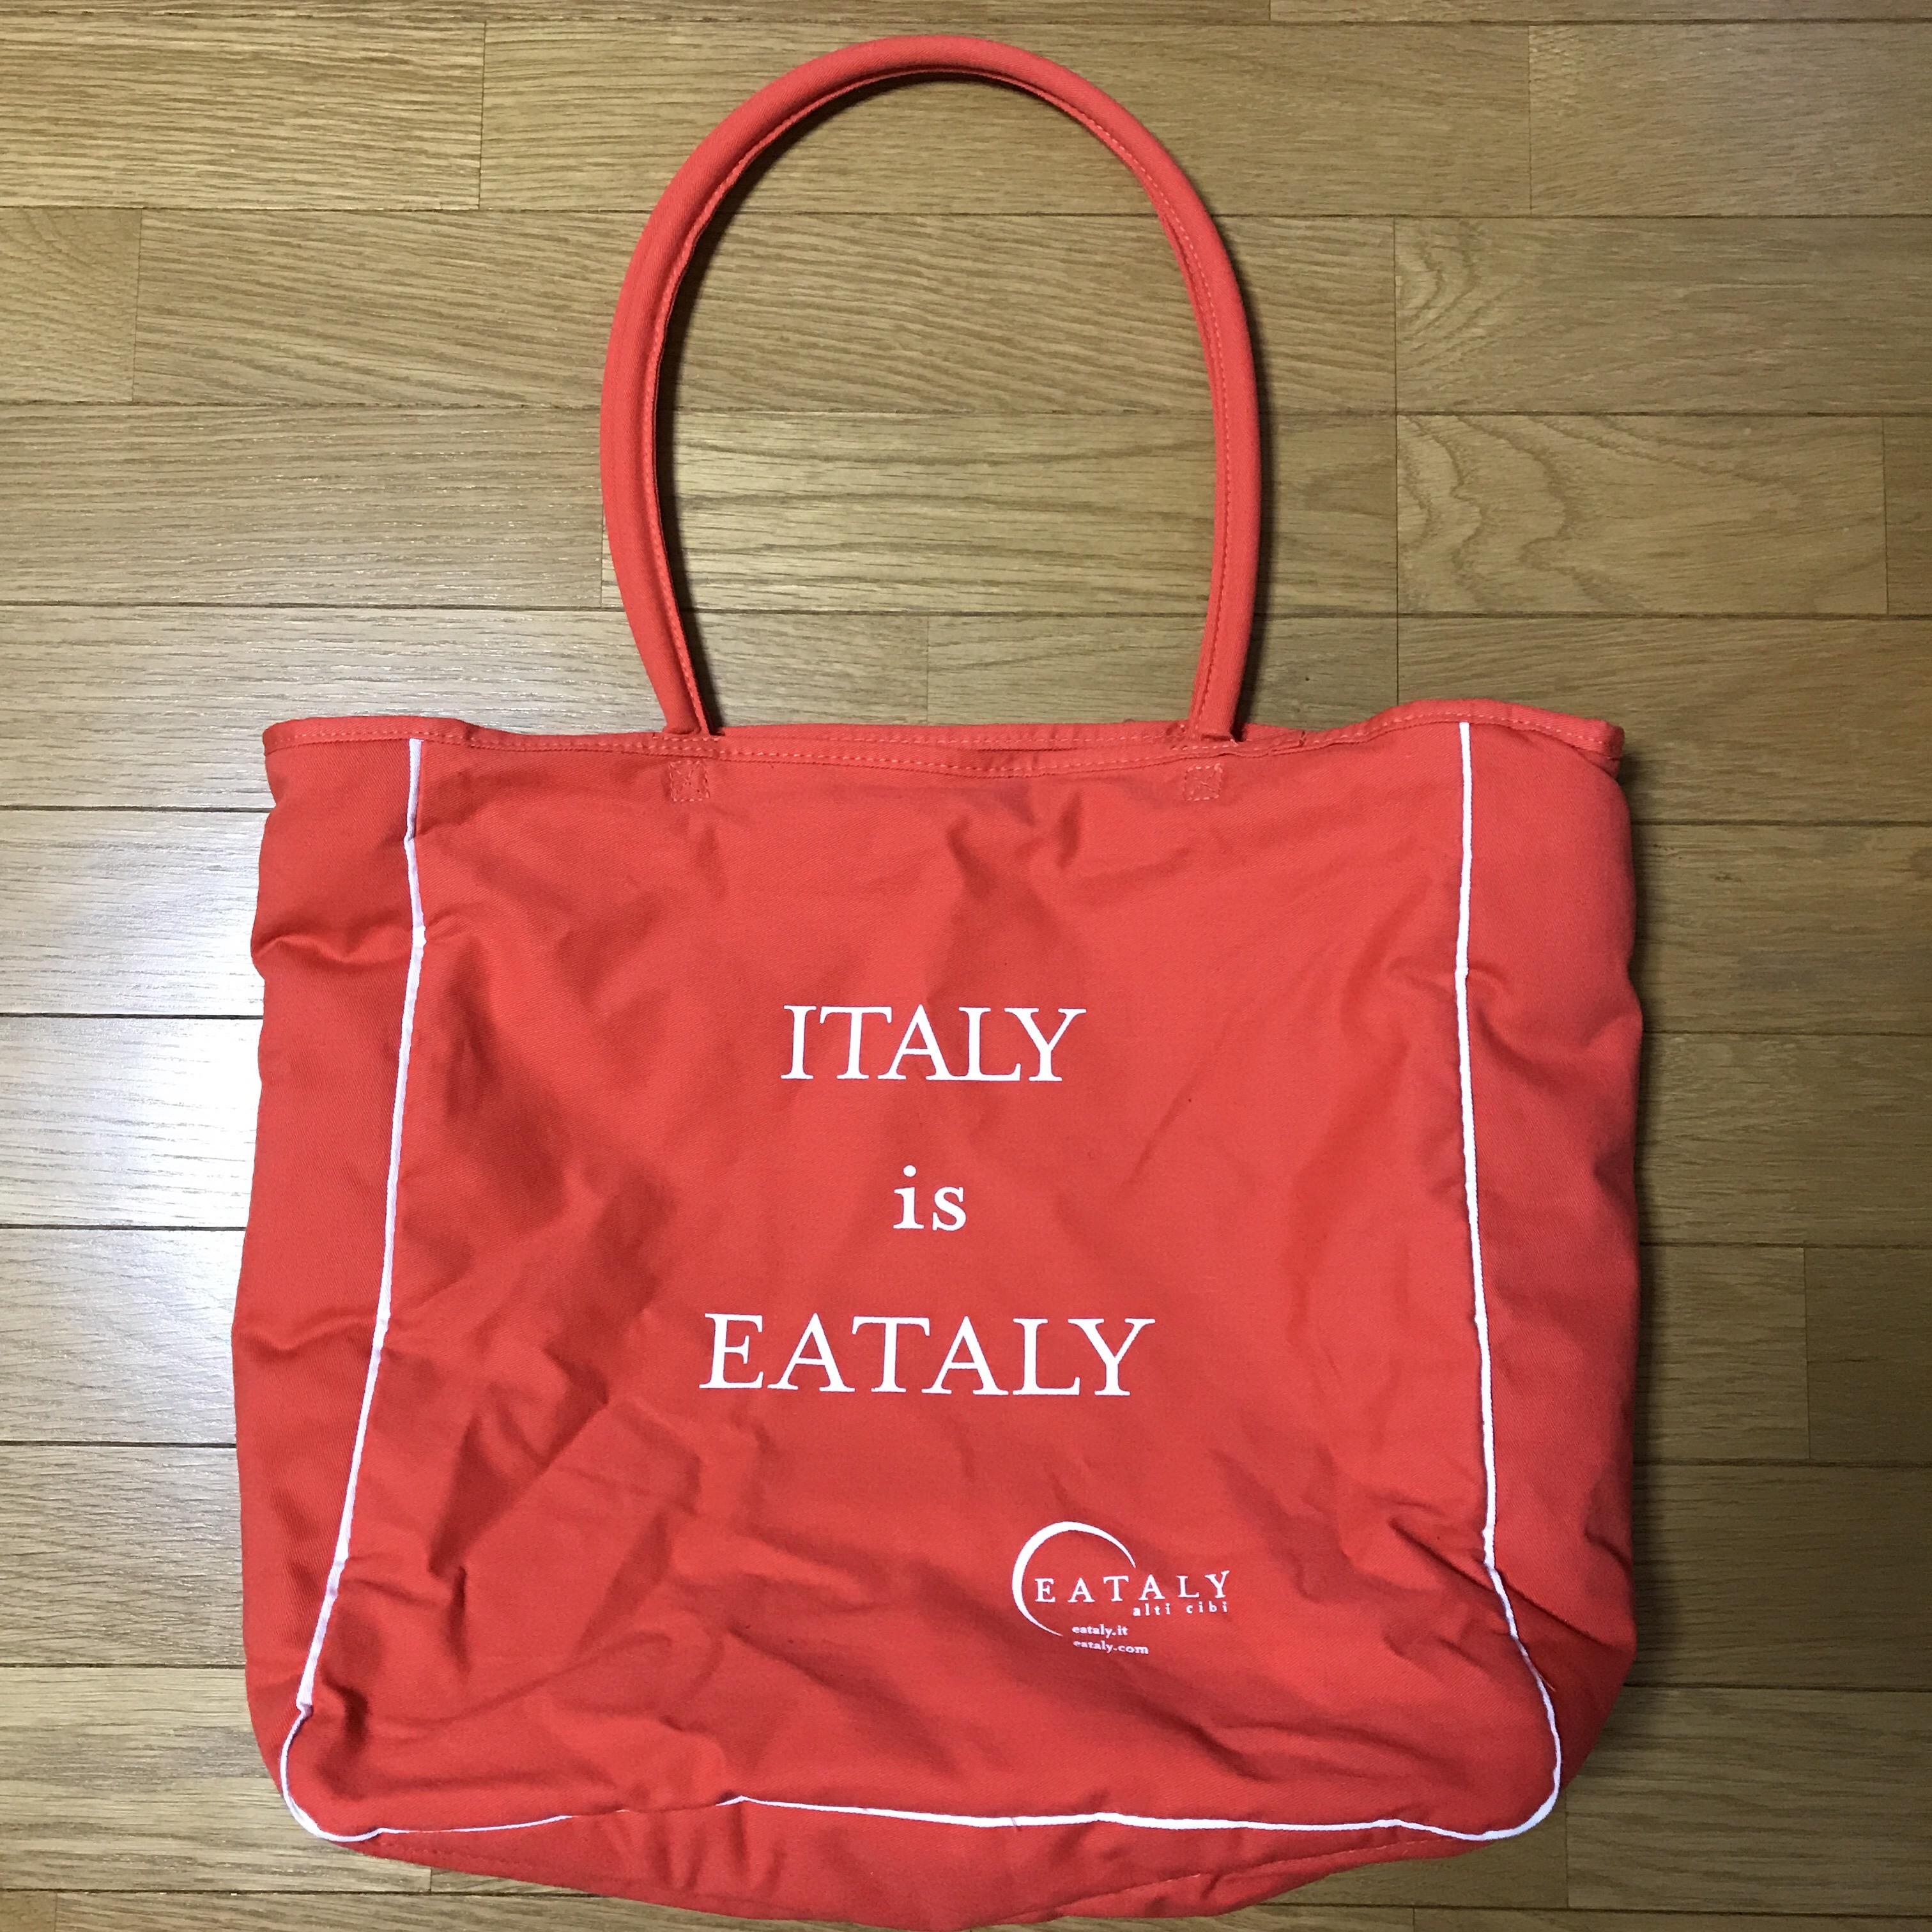 eataly-bag